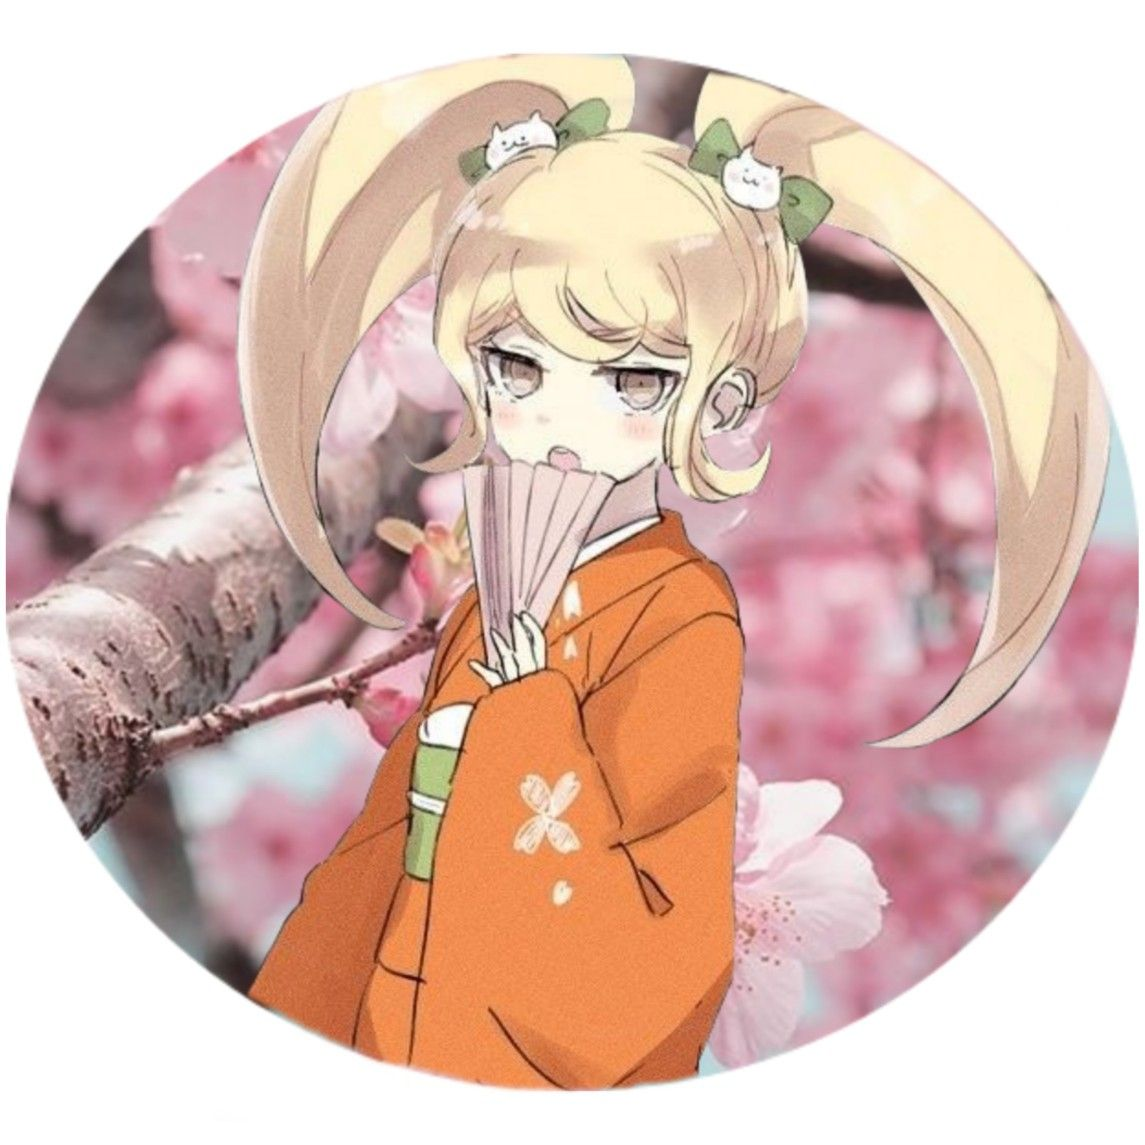 Hiyoko Saionji Icon Danganronpa Characters Cute Anime Wallpaper Anime Wallpaper